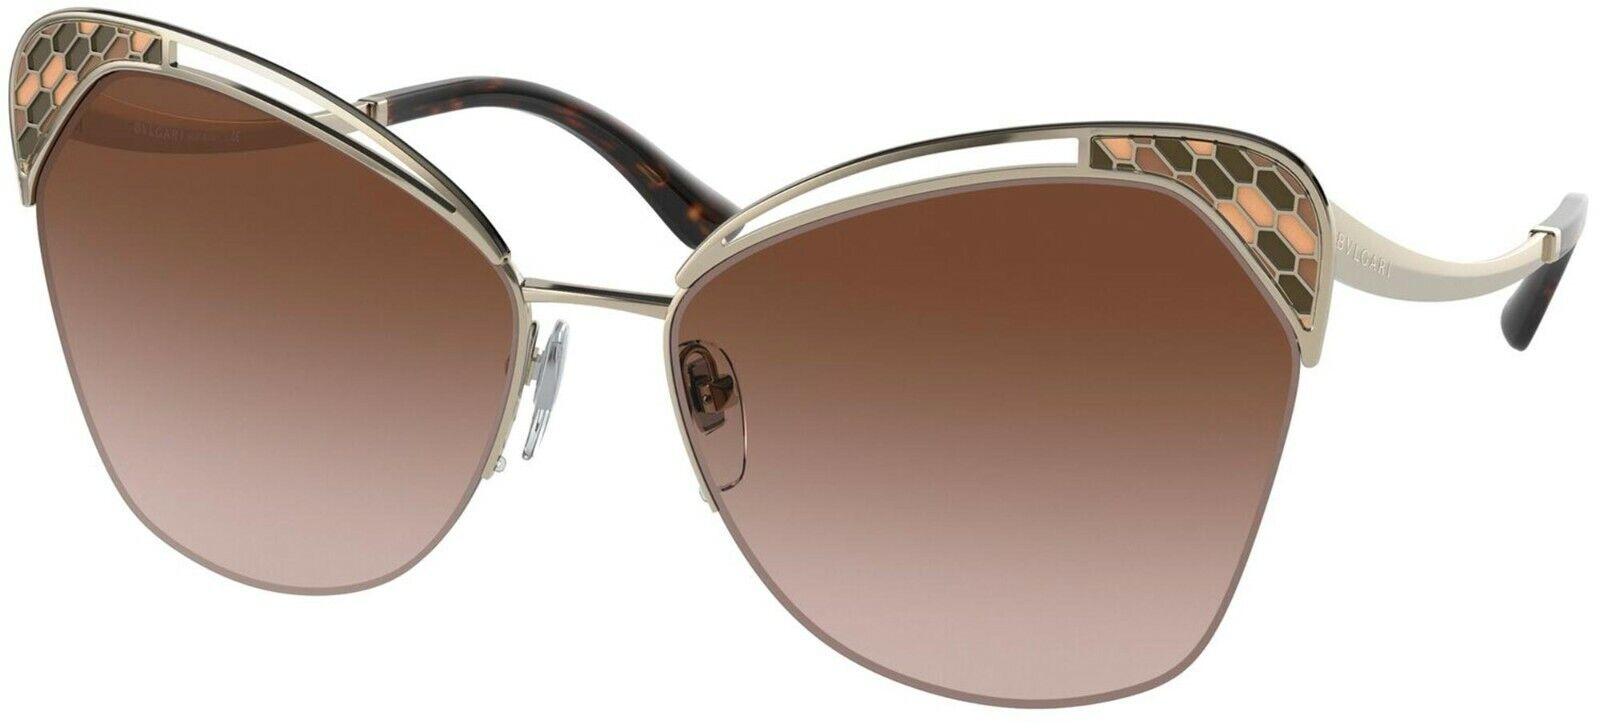 Bvlgari SERPENTI BV 6161 Pale Gold/Brown Shaded (278/13) Sunglasses